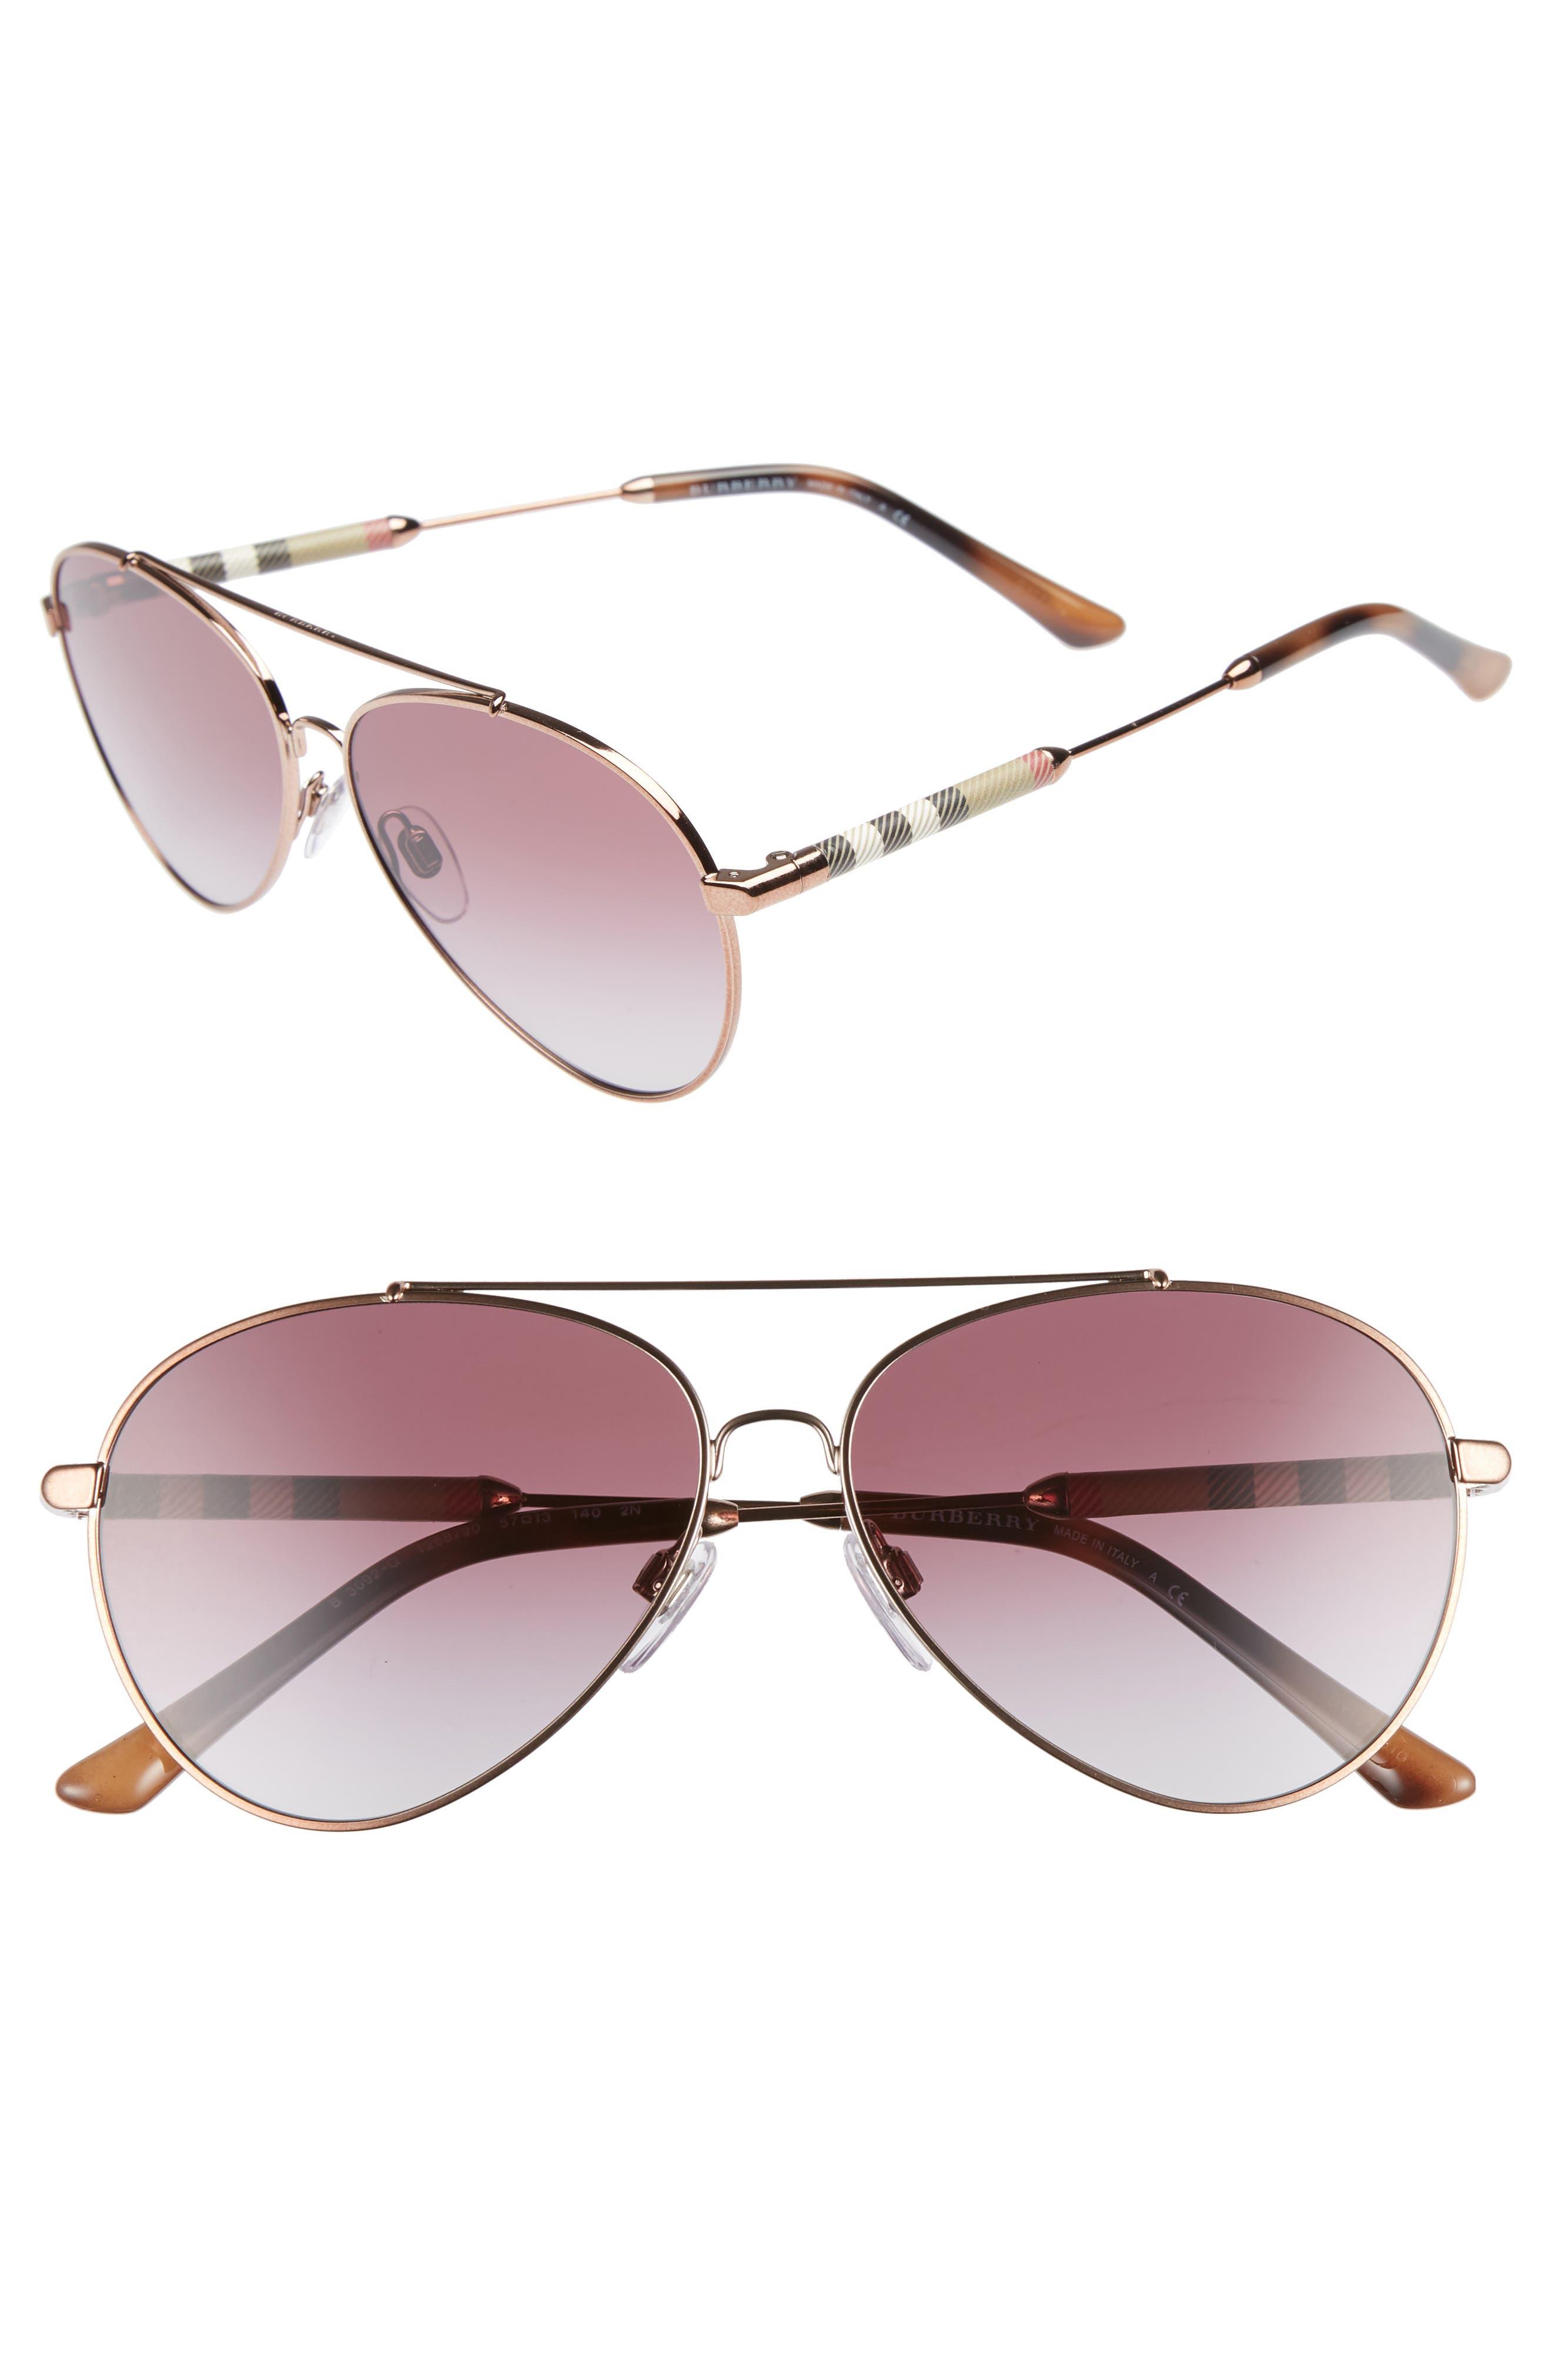 57mm Mirrored Aviator Sunglasses,                         Main,                         color, VIOLET GRADIENT